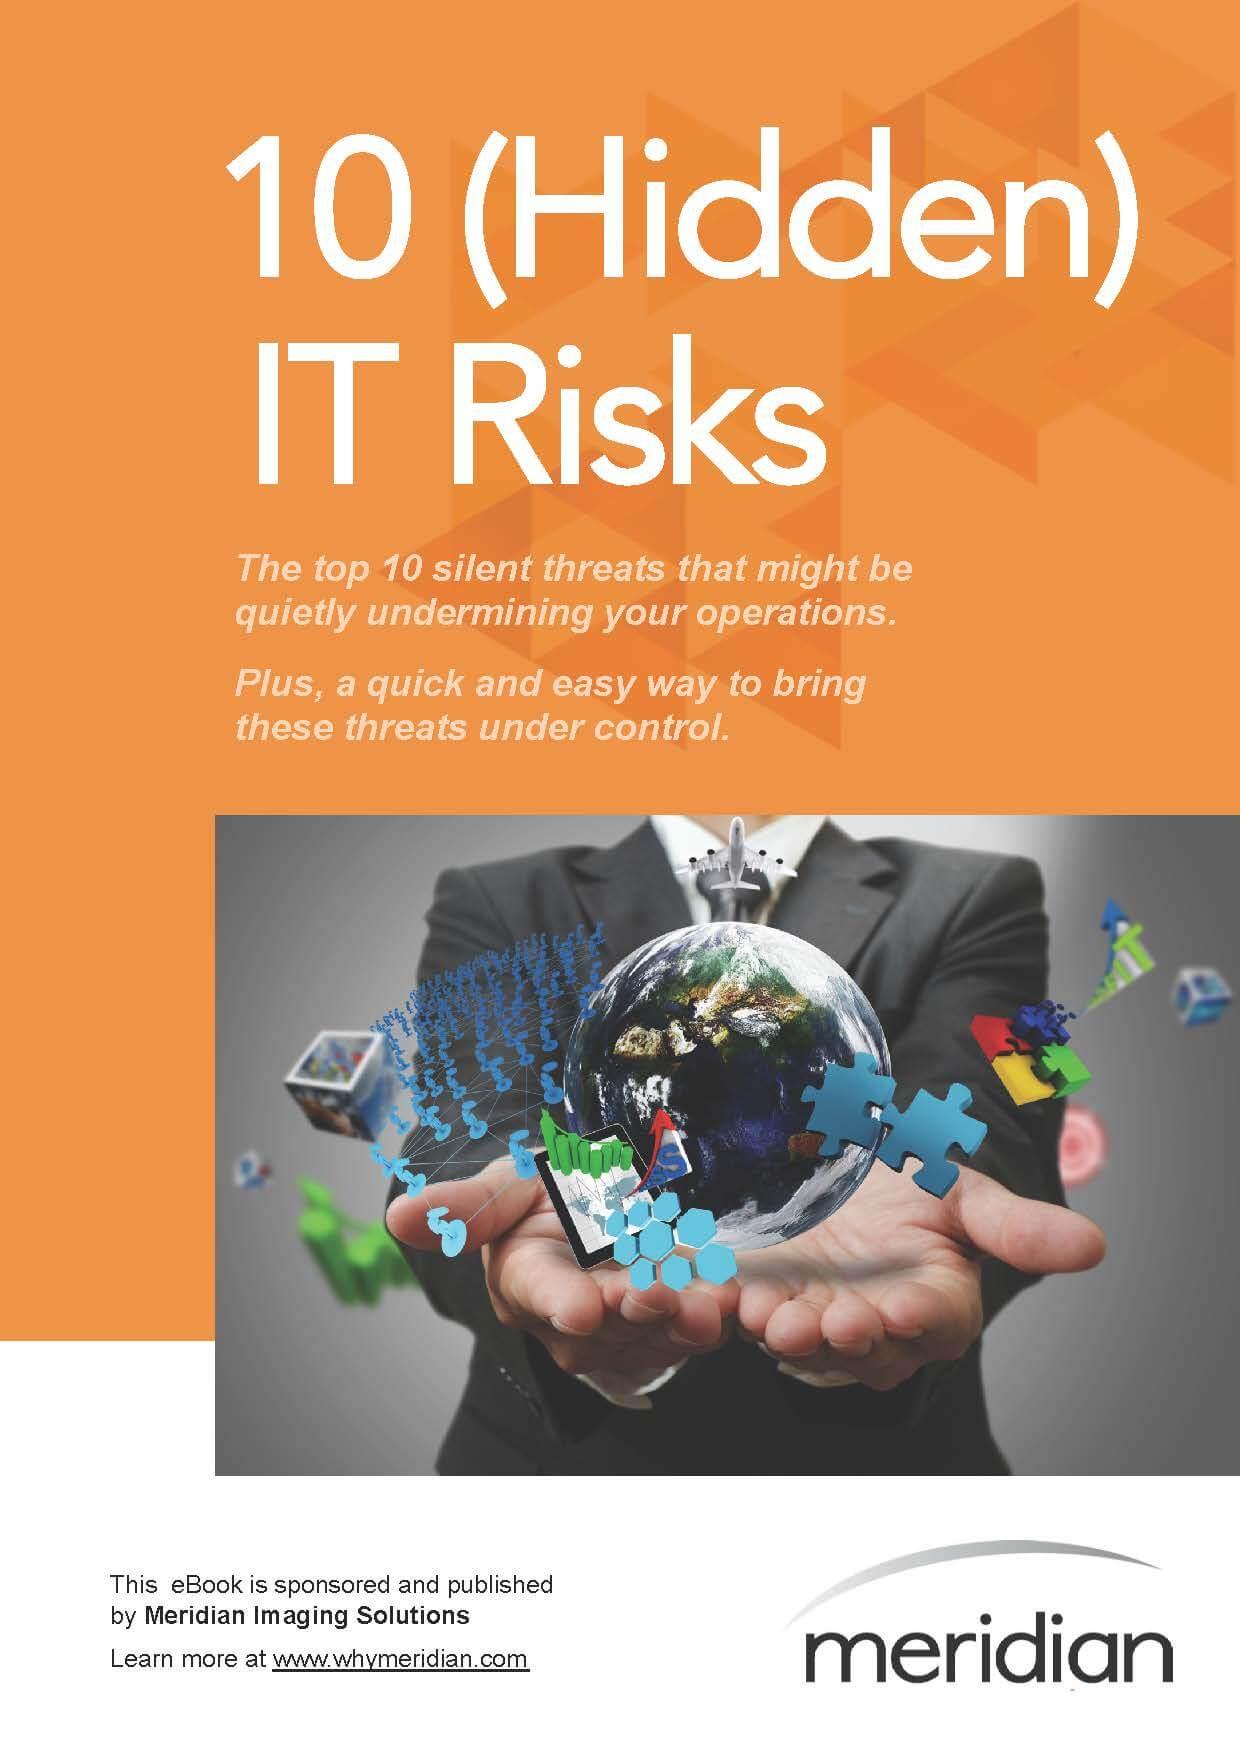 10-Hidden-IT-Risks-eBook-Cover.jpg